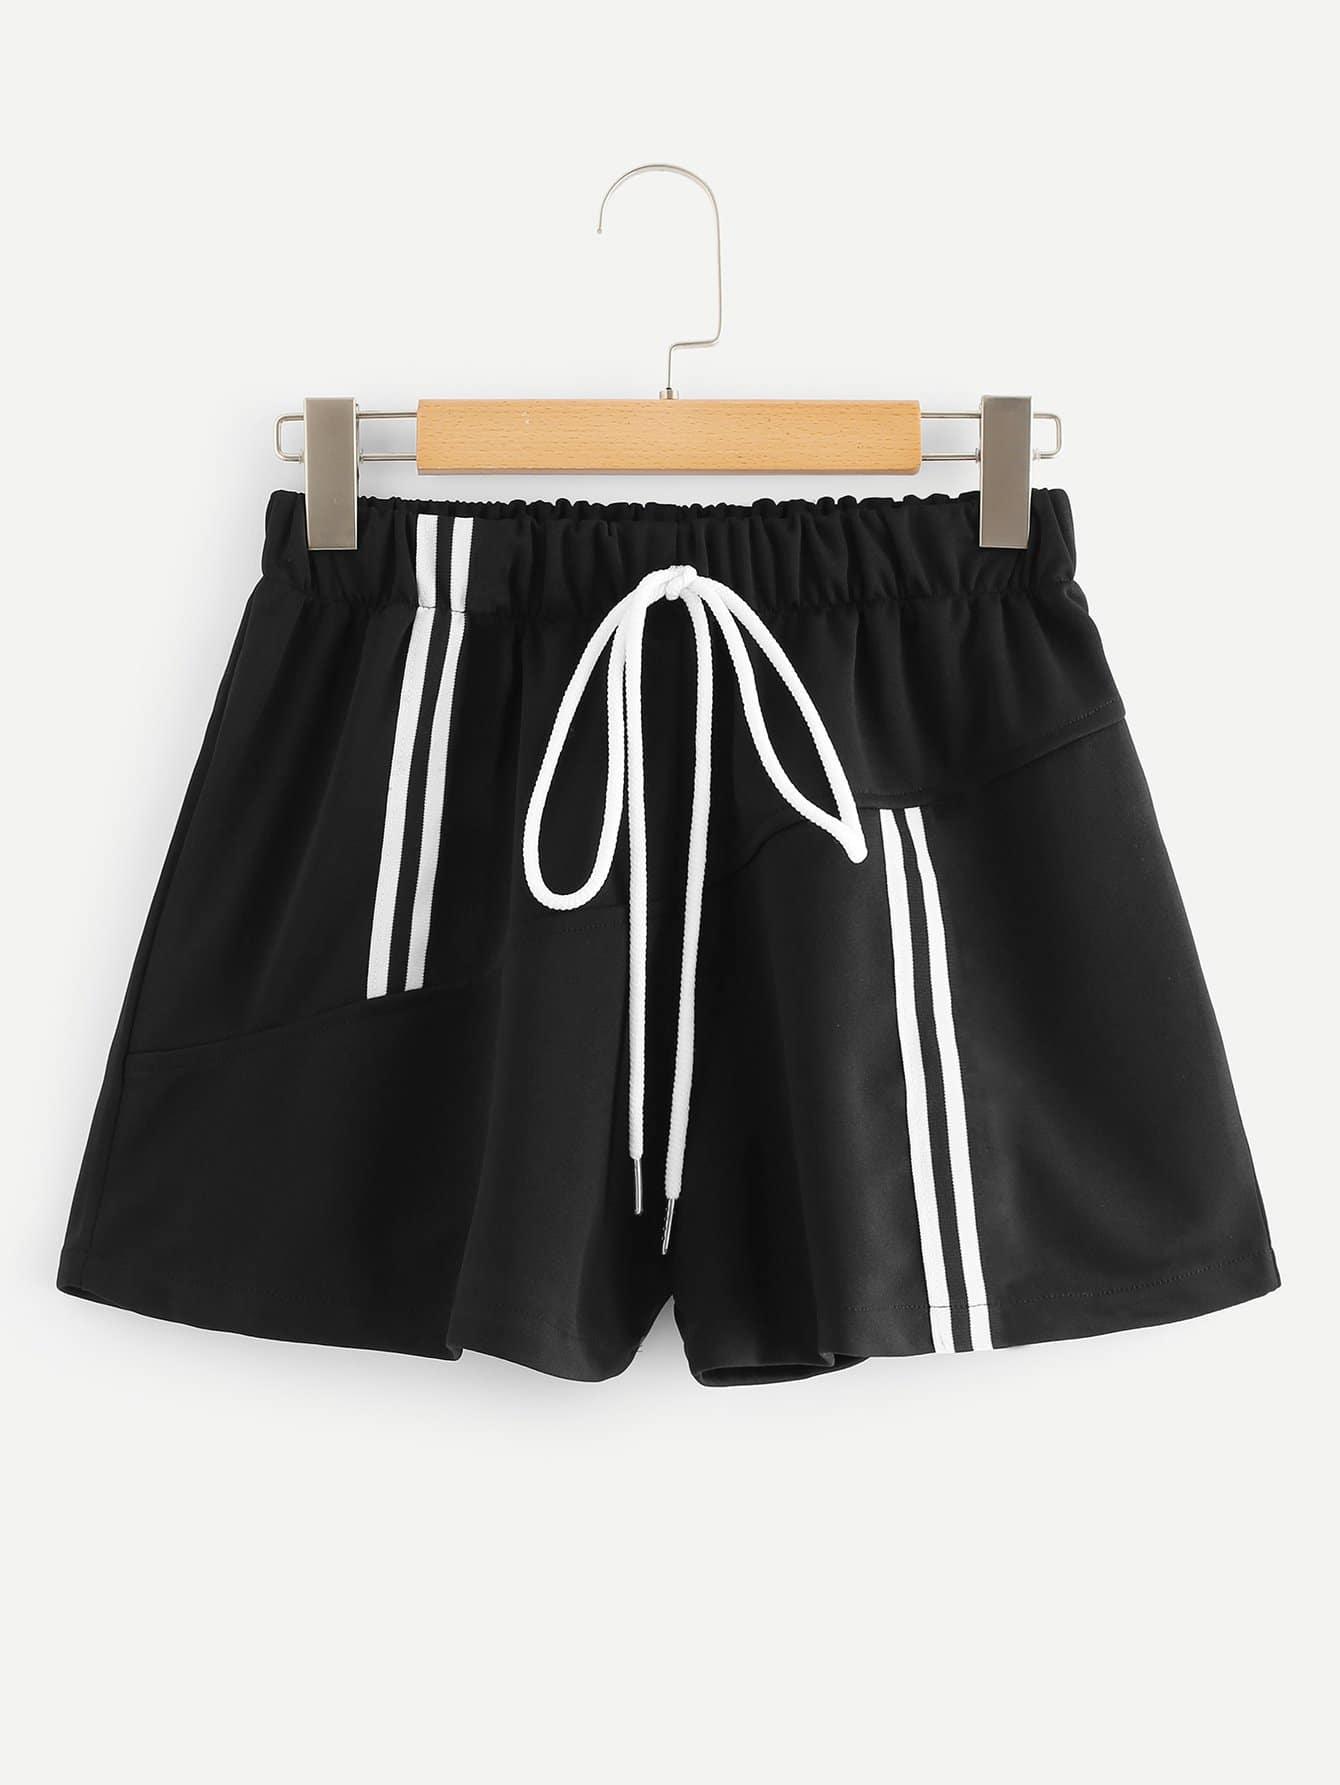 Striped Tape Drawstring Waist Shorts men striped tape side drawstring shorts